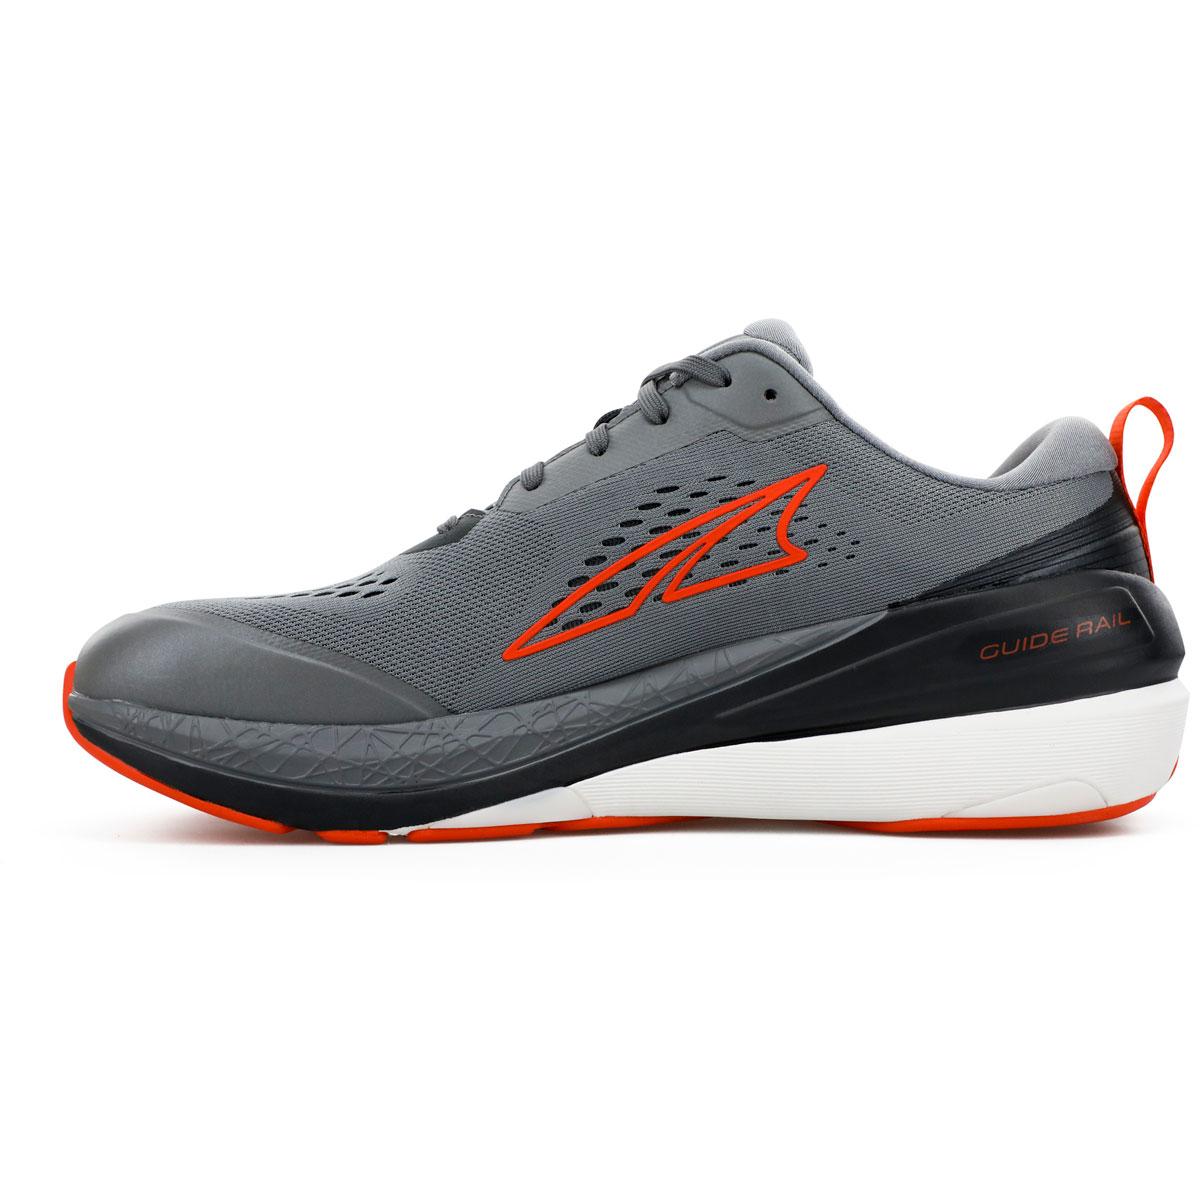 Men's Altra Paradigm 5 Running Shoe - Color: Gray/Orange - Size: 9.5 - Width: Regular, Gray/Orange, large, image 2